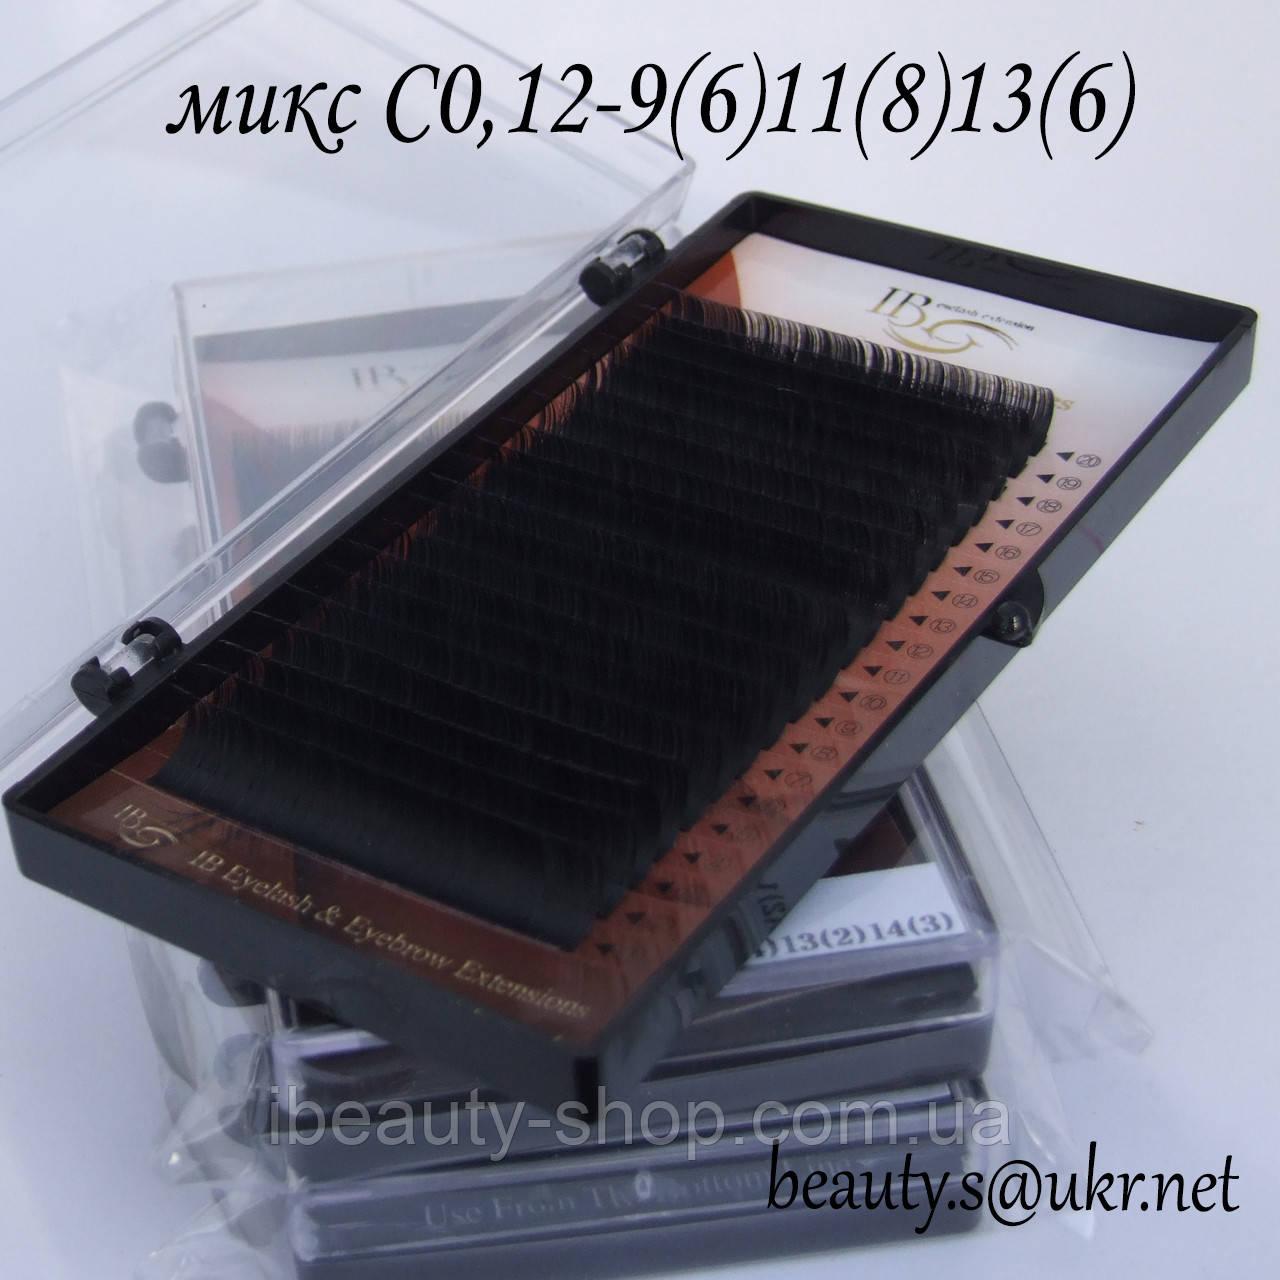 Ресницы I-Beauty микс С-0,12 9-11-13мм